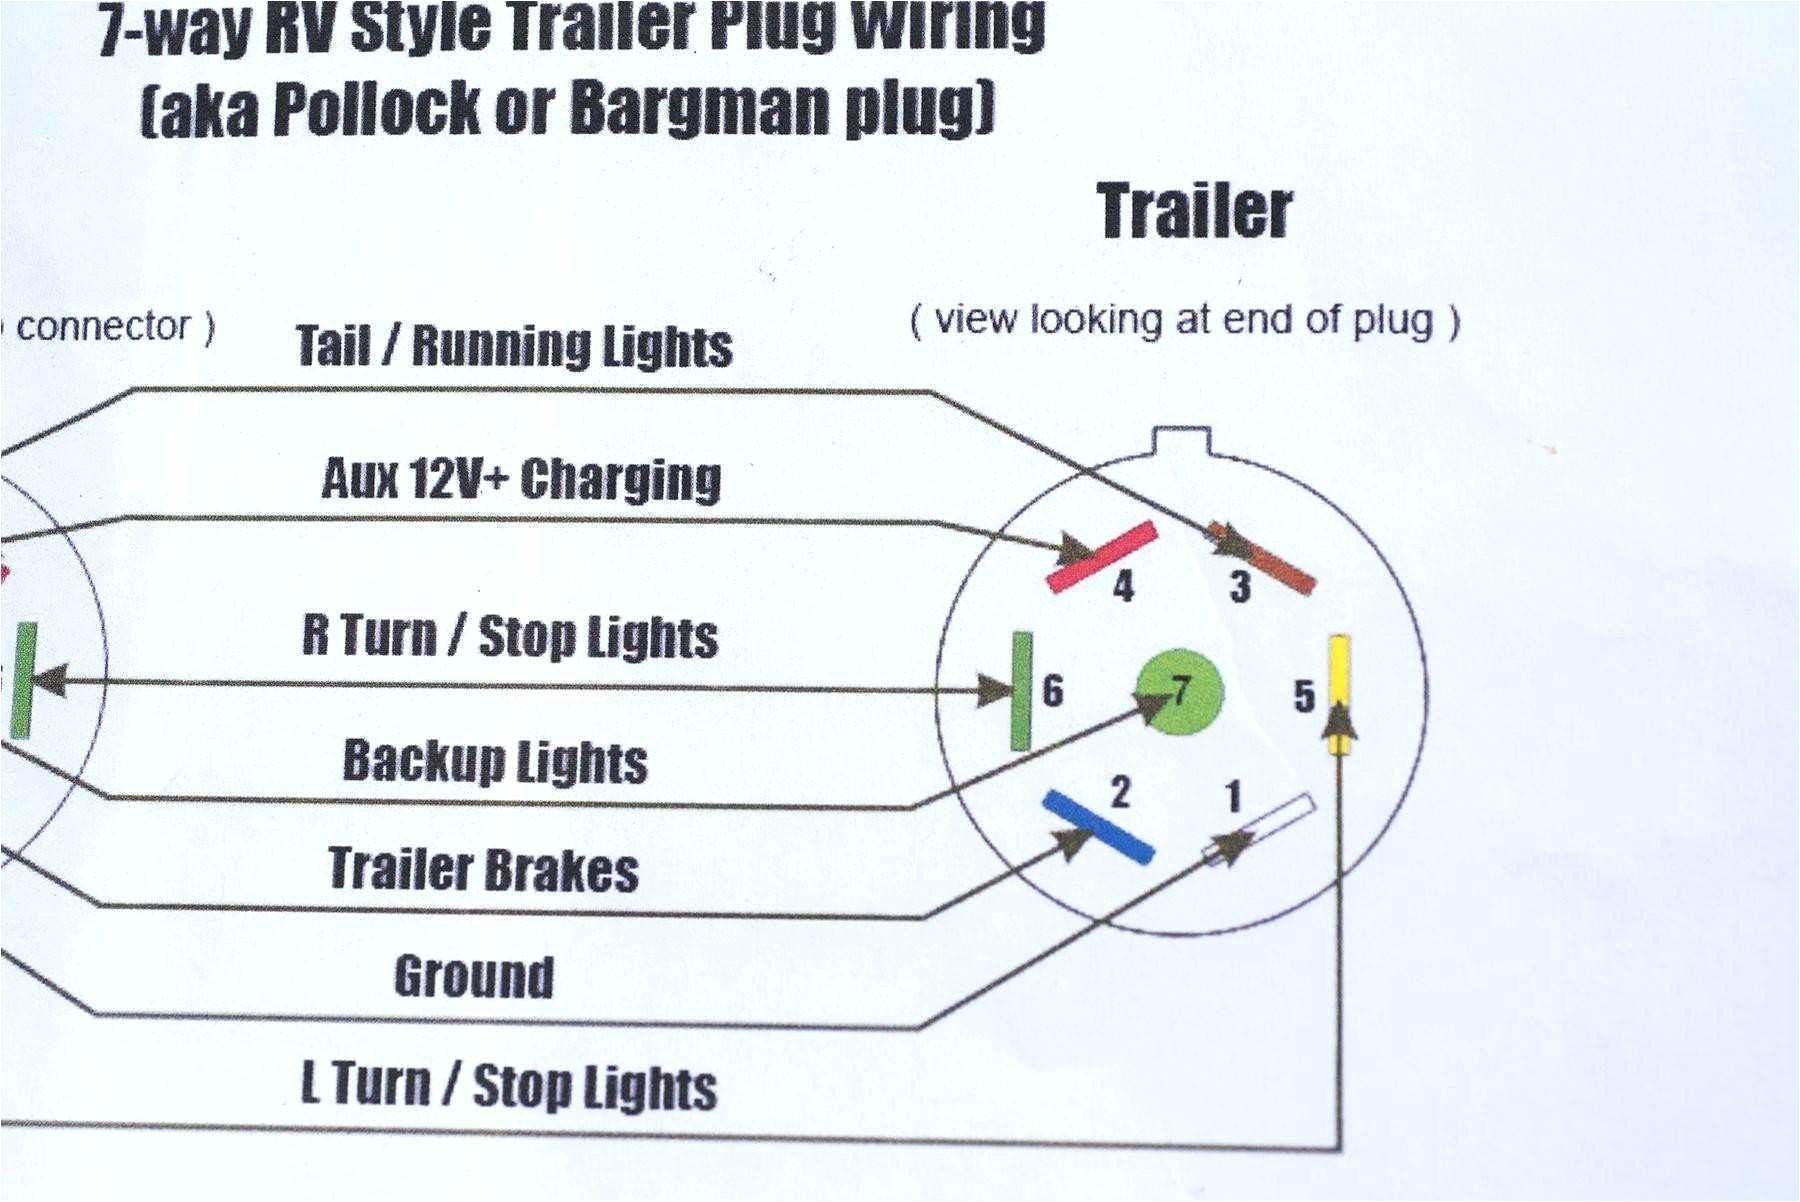 dodge ram 7 pin trailer wiring diagram inspirational wiring diagram for 13 pin caravan socket ford focus inside at stereo of dodge ram 7 pin trailer wiring diagram 10 5 pin trailer plug jpg